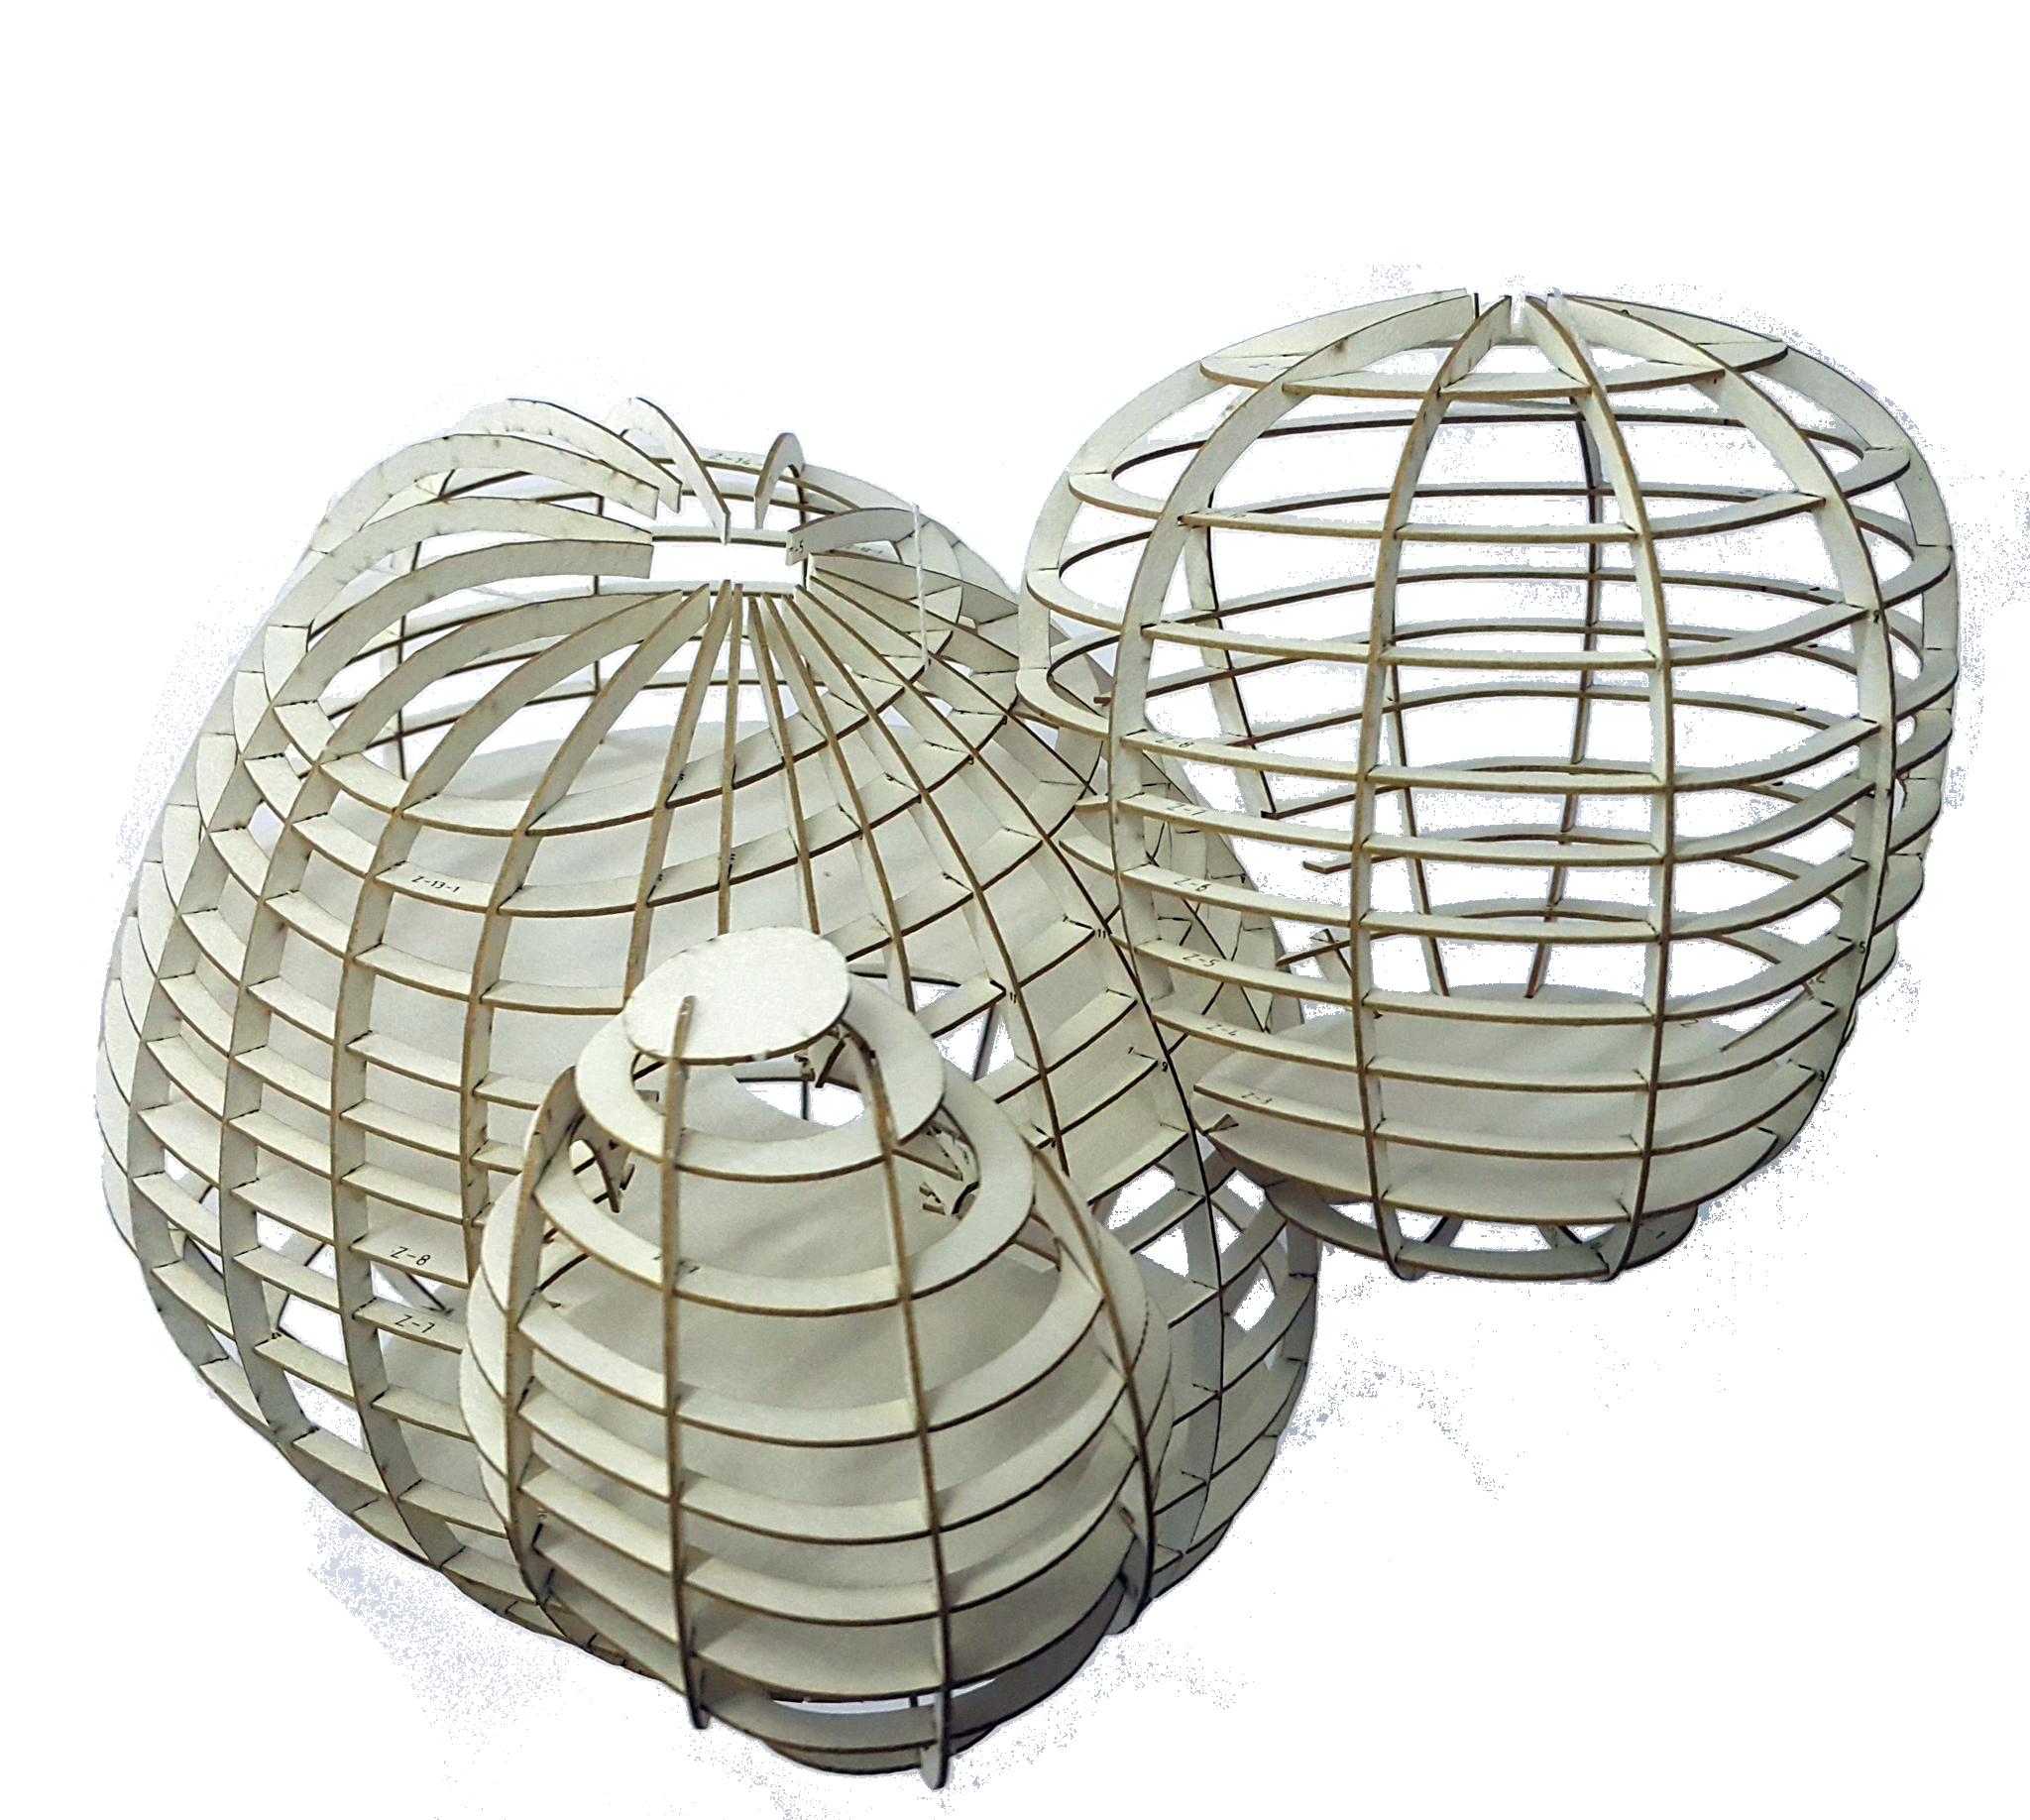 PLUG-IN Symbiotic/Parasitic Capsule Living Structure, 123D Make Cardboard Model - Student Project 2015, Shenkar, Israel, AK Design www.annakislitsina.com